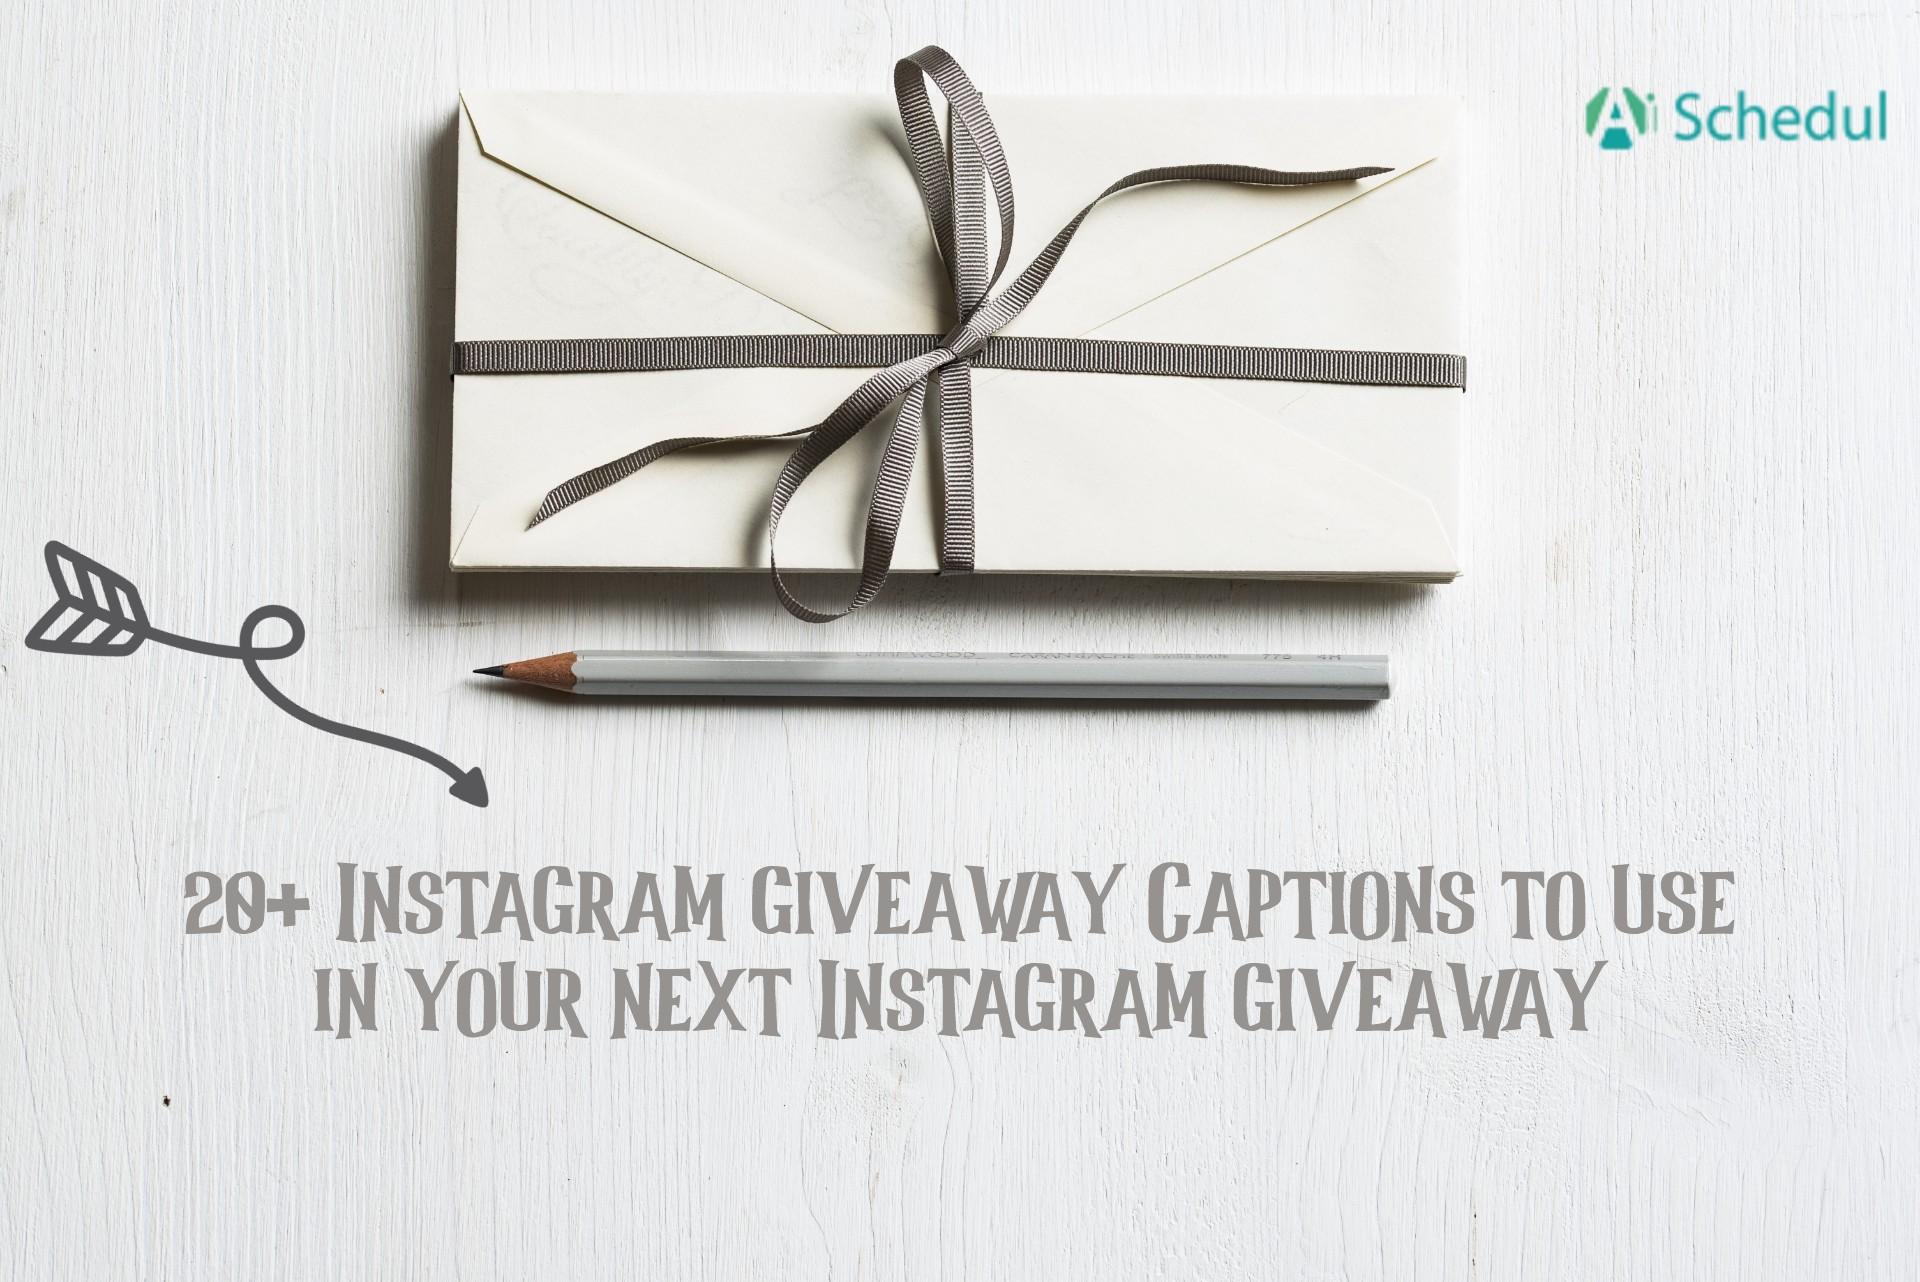 Instagram giveaway caption